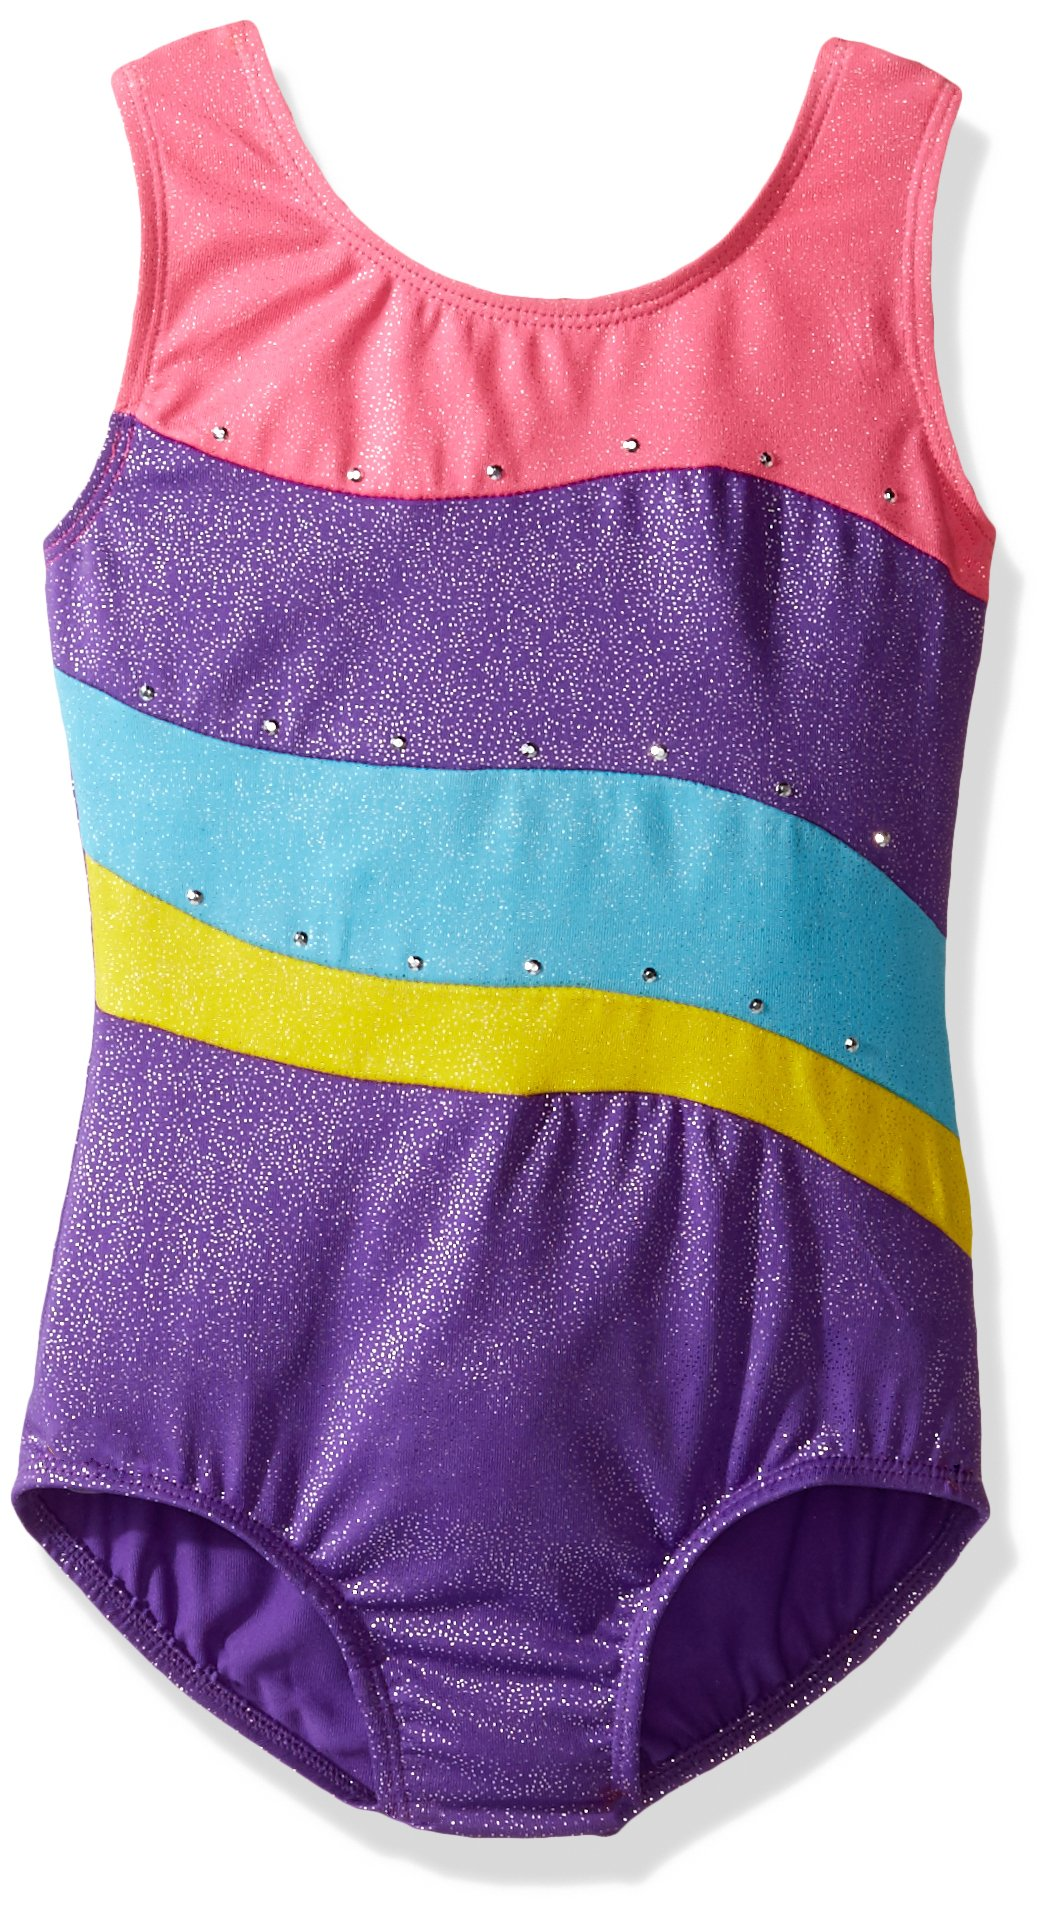 Jacques Moret Little Girls' Gymnastics Printed Leotard, Purple Shock Combo, Small